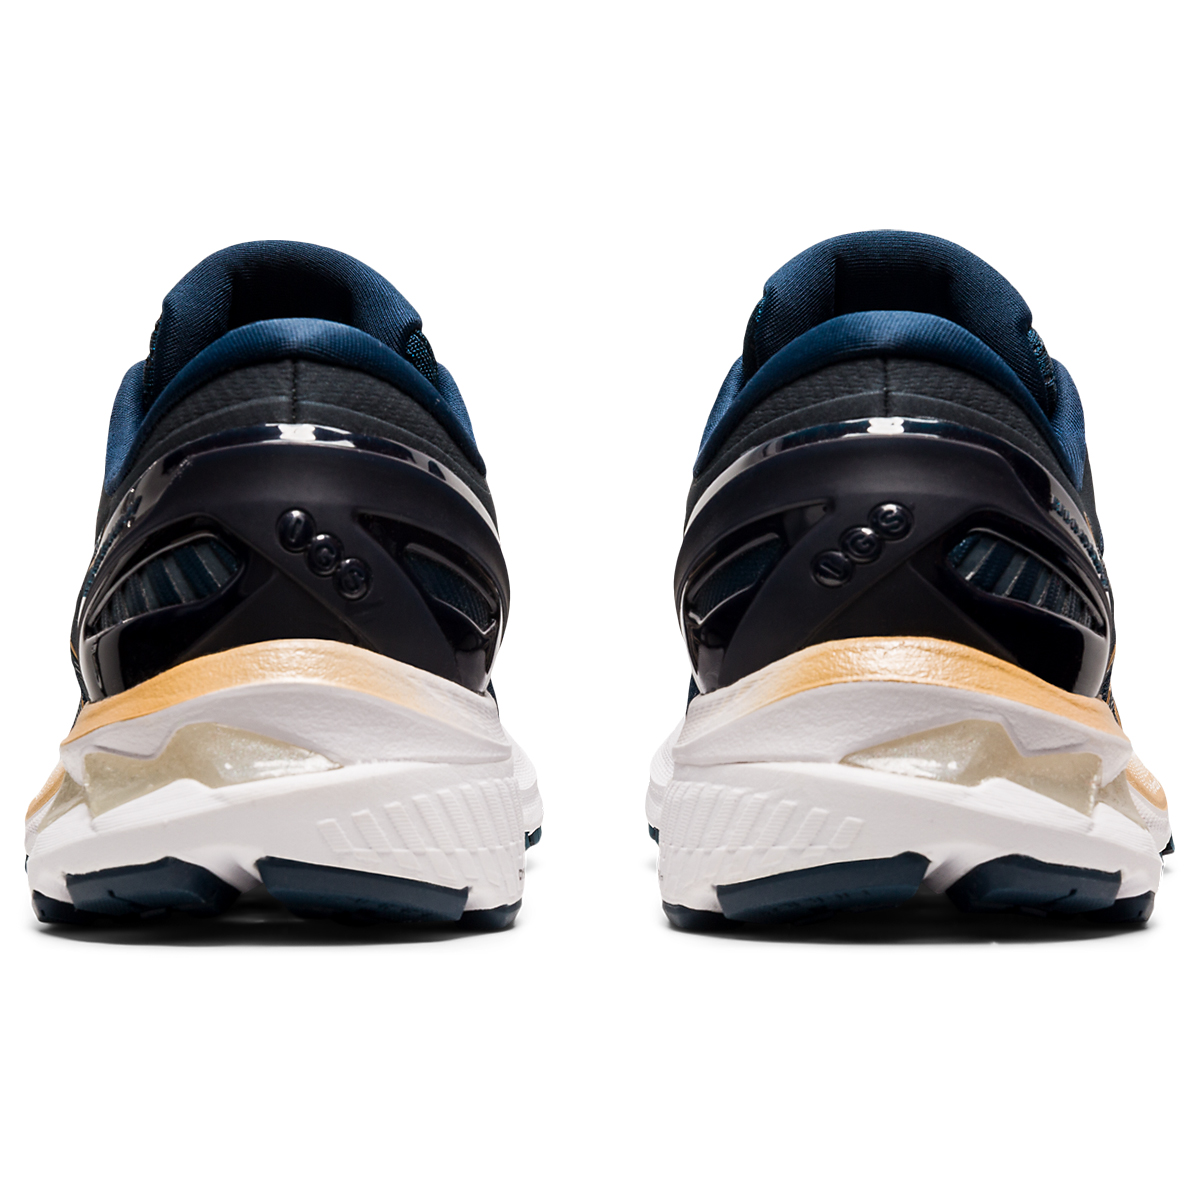 Women's Asics Gel-Kayano 27 Running Shoe - Color: French Blue/Black/Orange - Size: 5 - Width: Regular, French Blue/Black/Orange, large, image 5